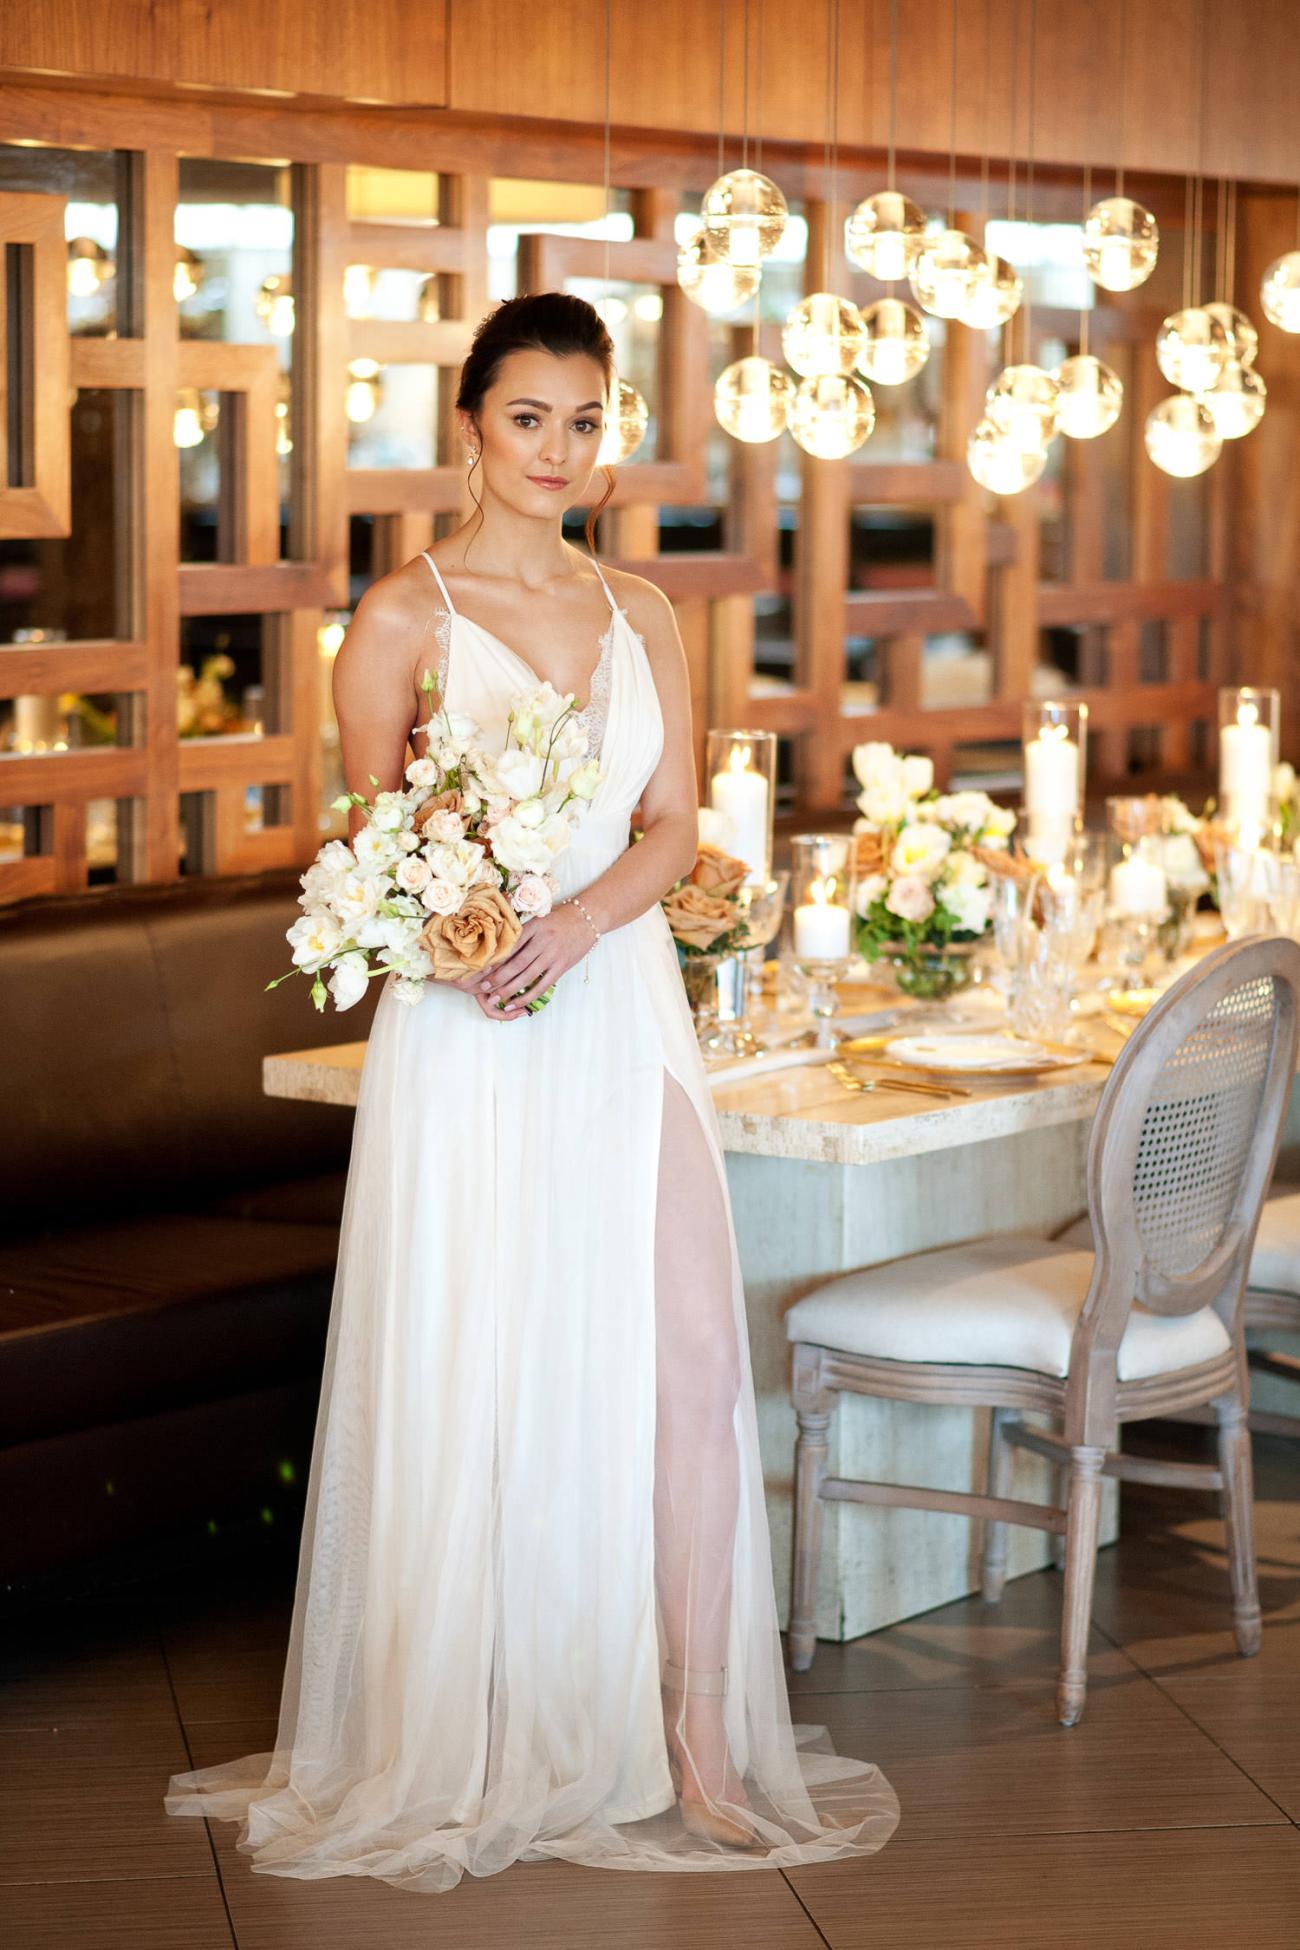 bride at her Alloy Restaurant wedding captured by Tara Whittaker Photography